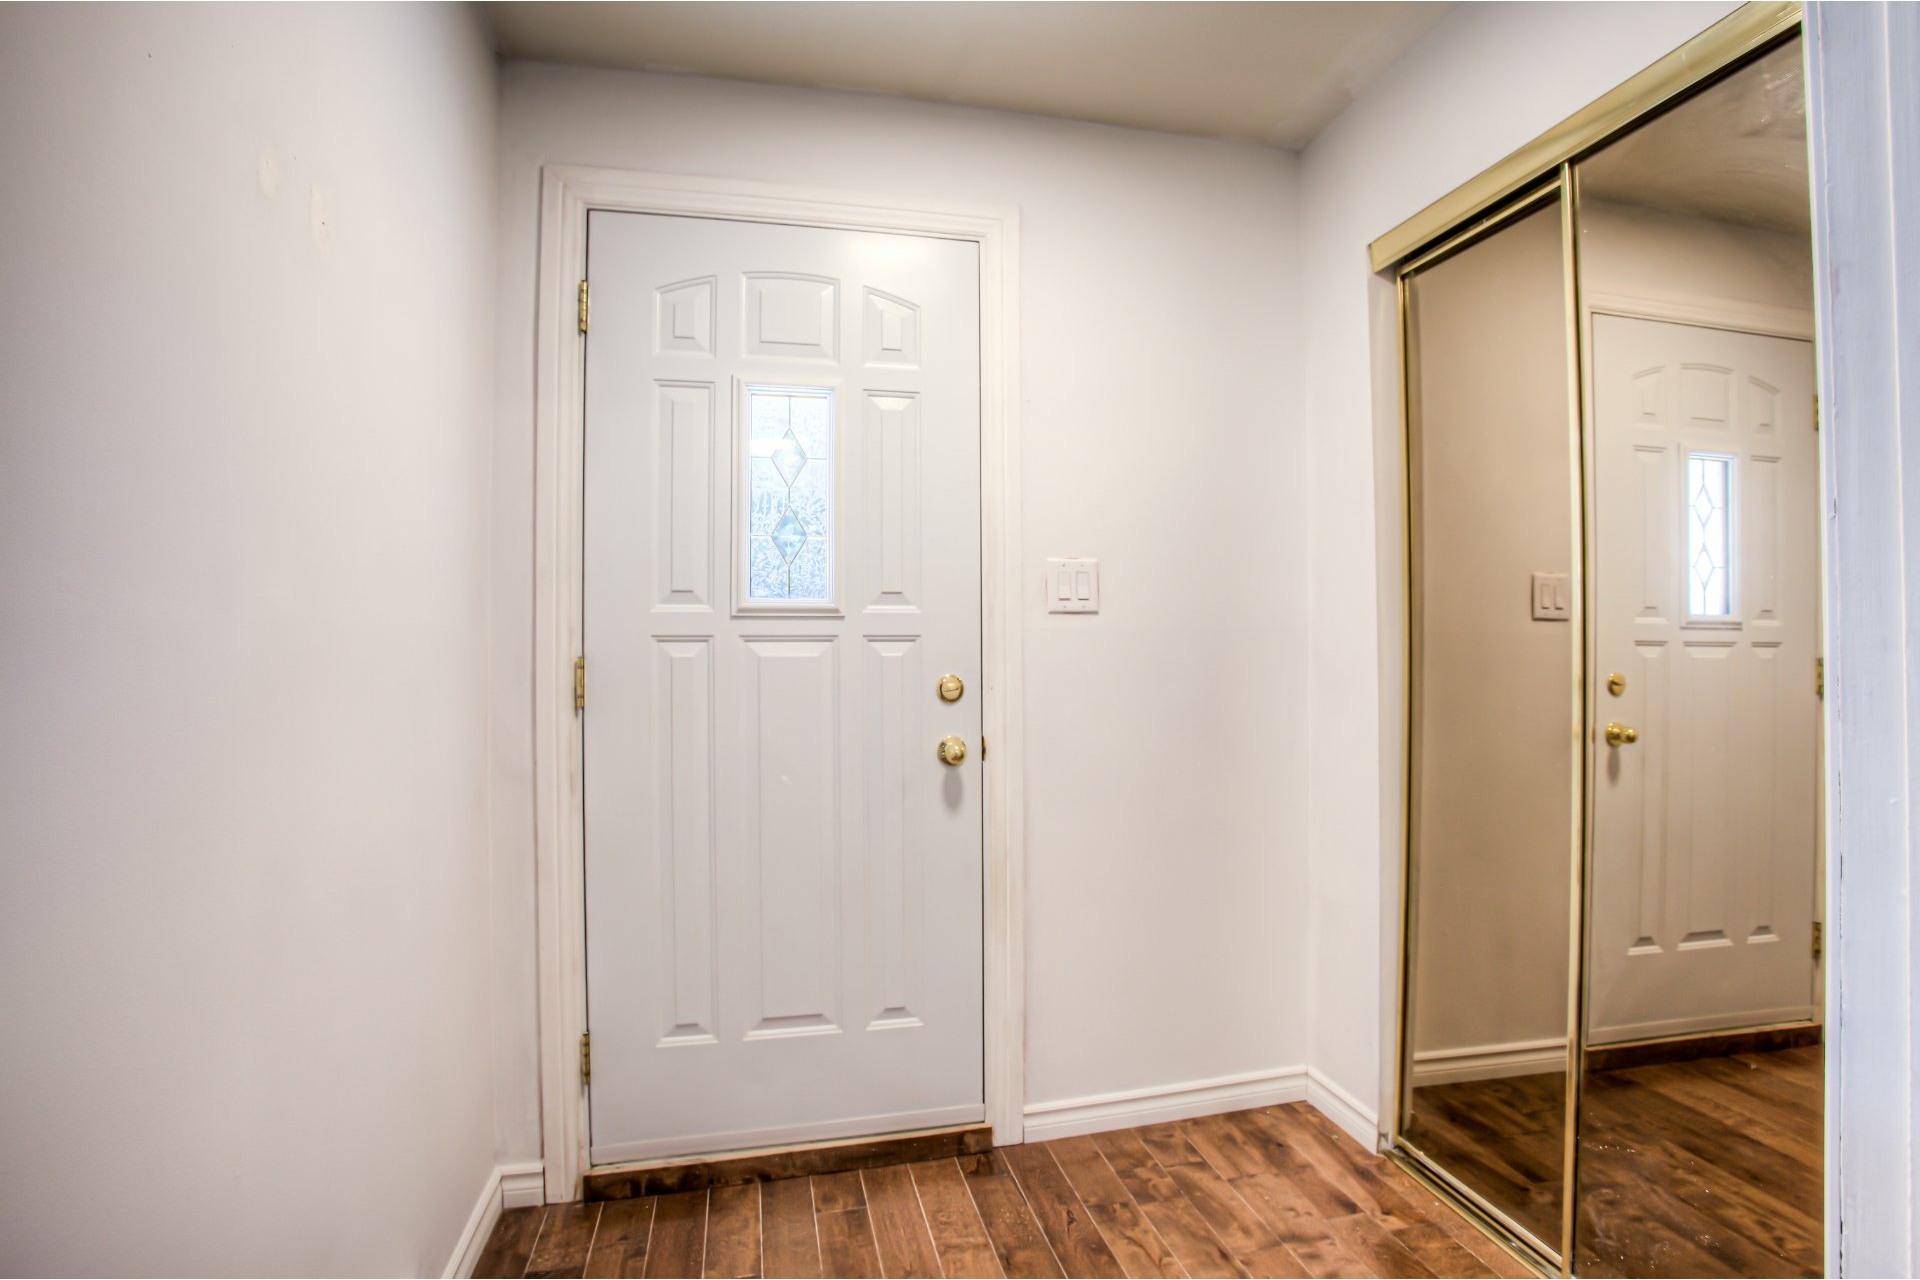 image 2 - MX - Casa sola - MX En venta Dollard-Des Ormeaux - 7 habitaciones